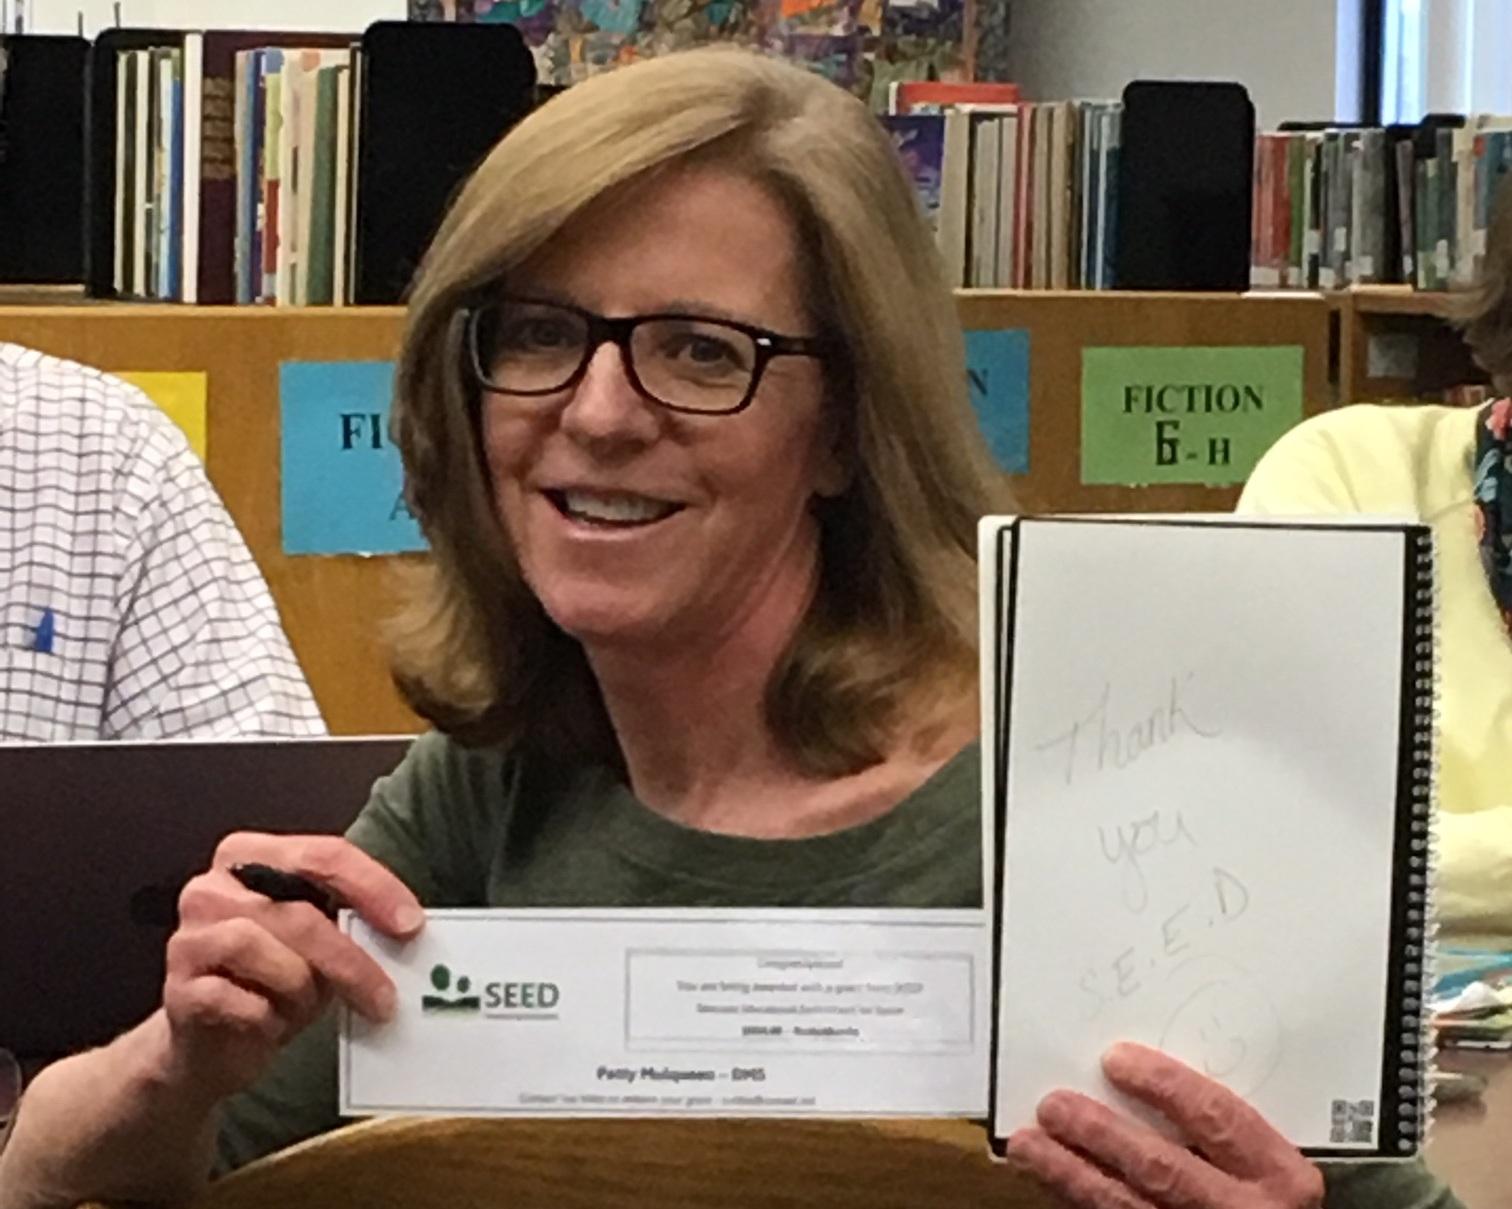 Math teacher Patty Mulqueen provided 2 dozen Rocketbooks for DMS students.